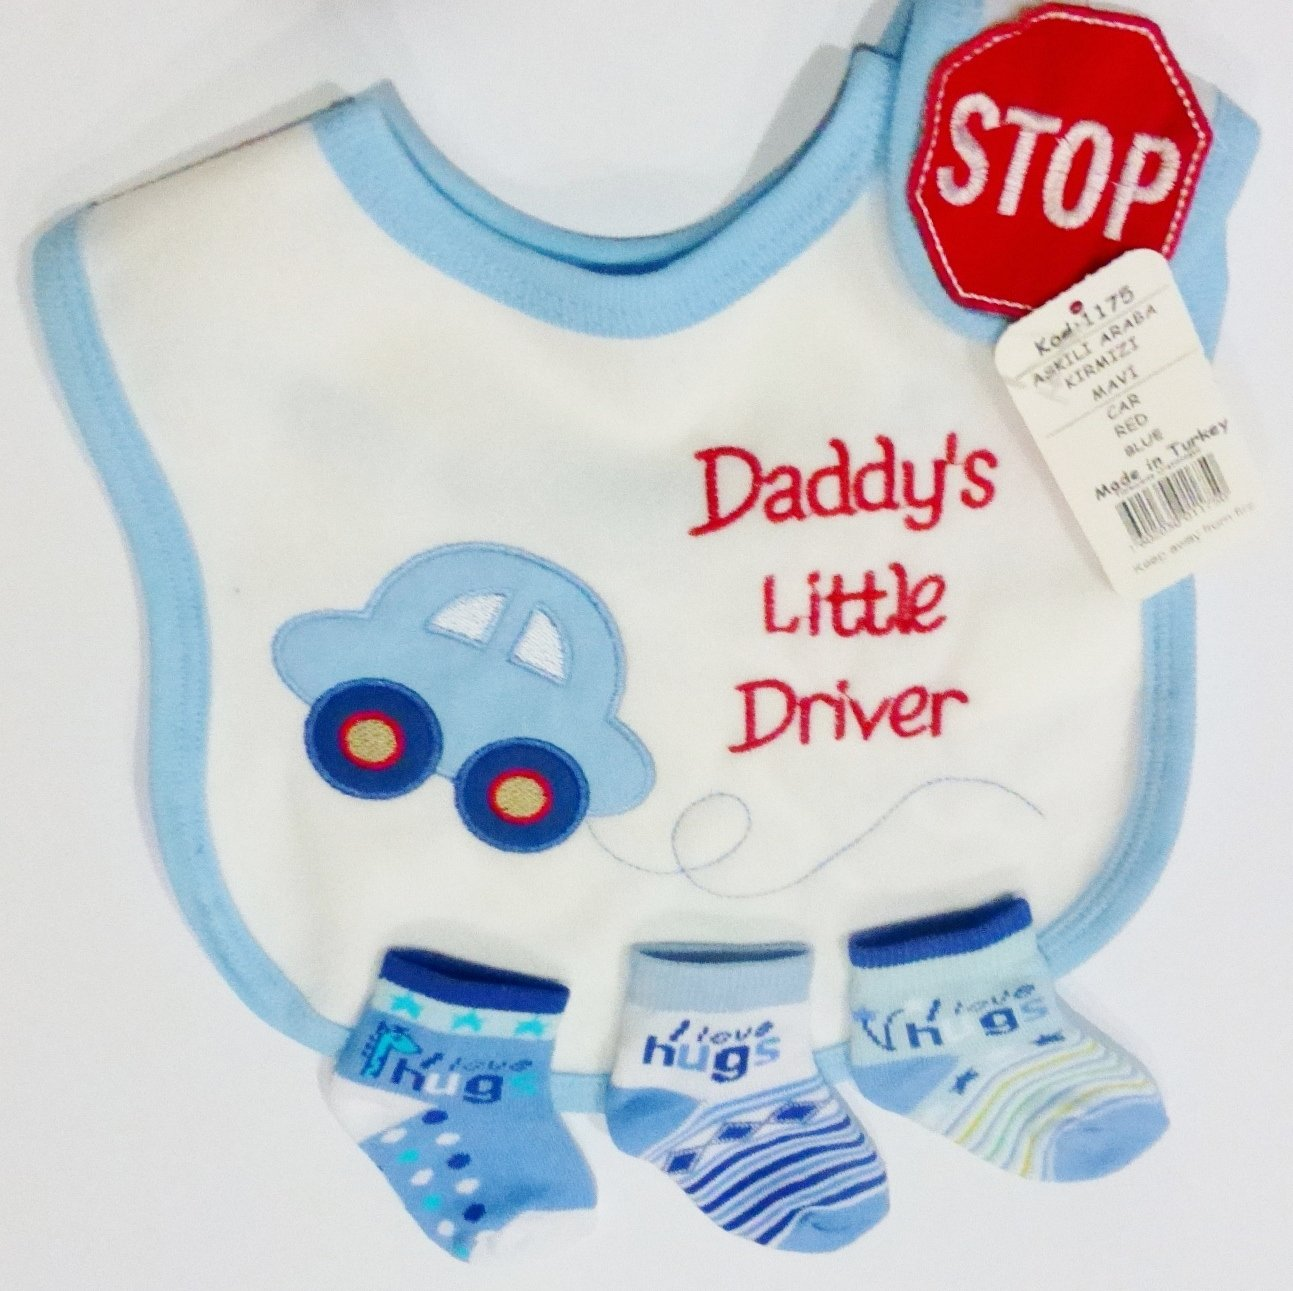 Baby Bib with Blue Car /& Socks 6-12 Months I Love Hugs